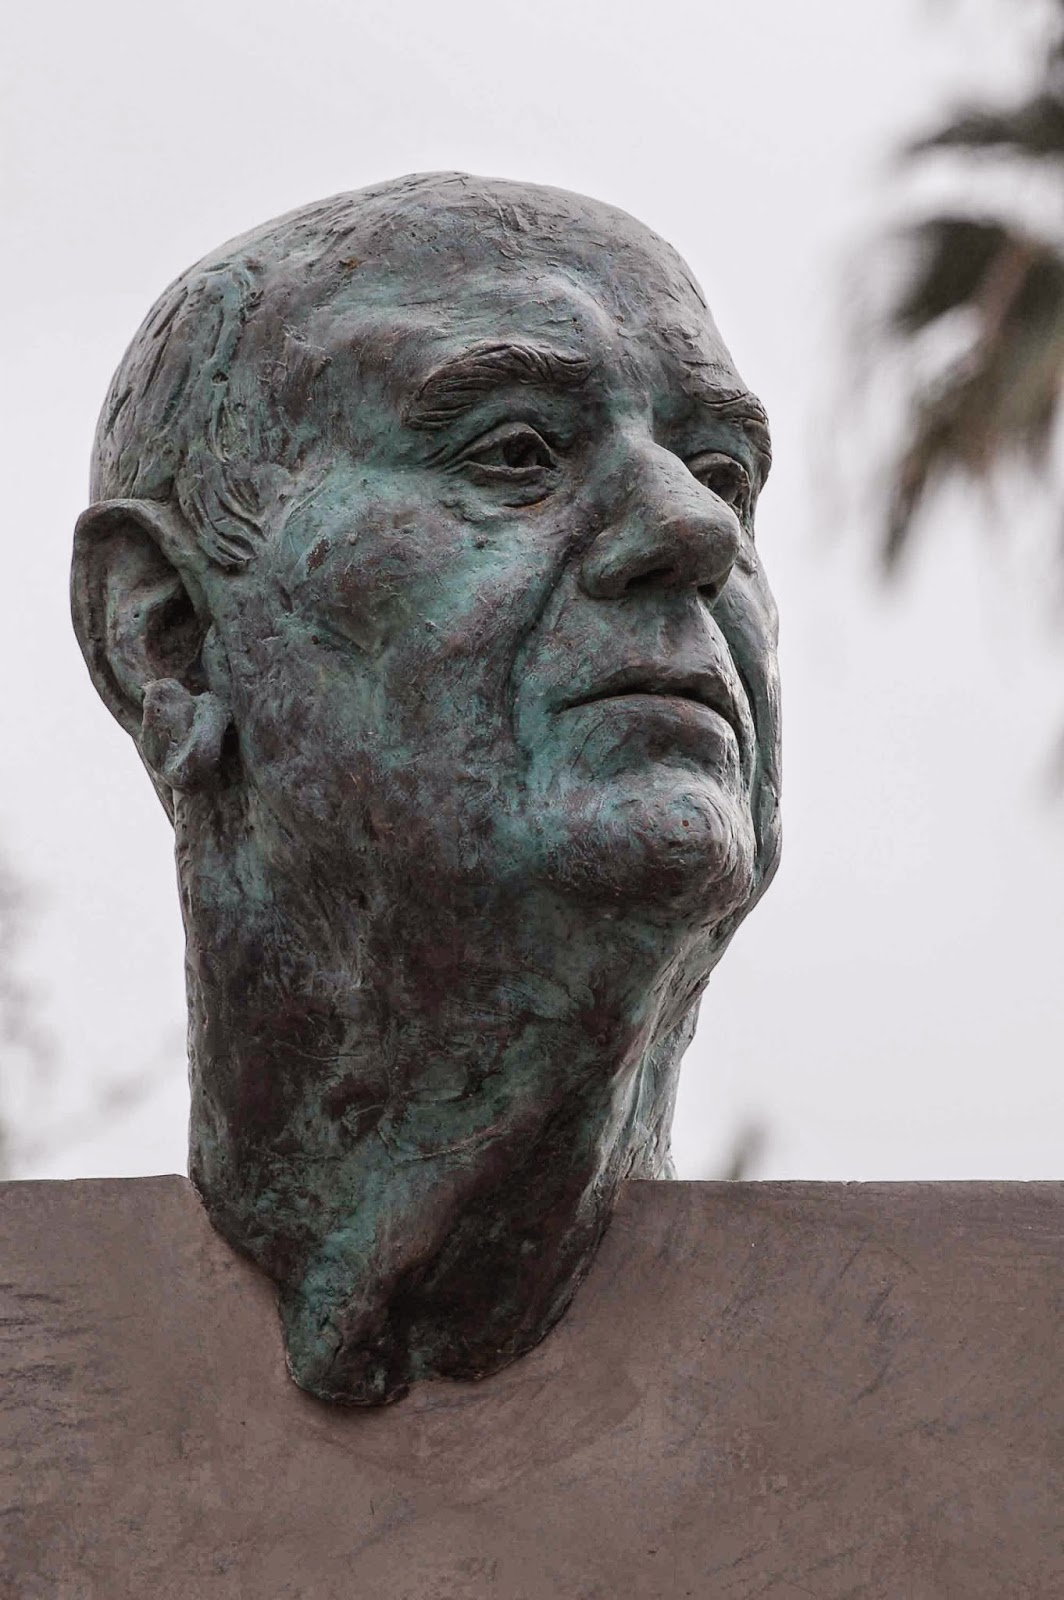 Monumento bronce Fuente Álamo Murcia Arturo Serra escultura 5